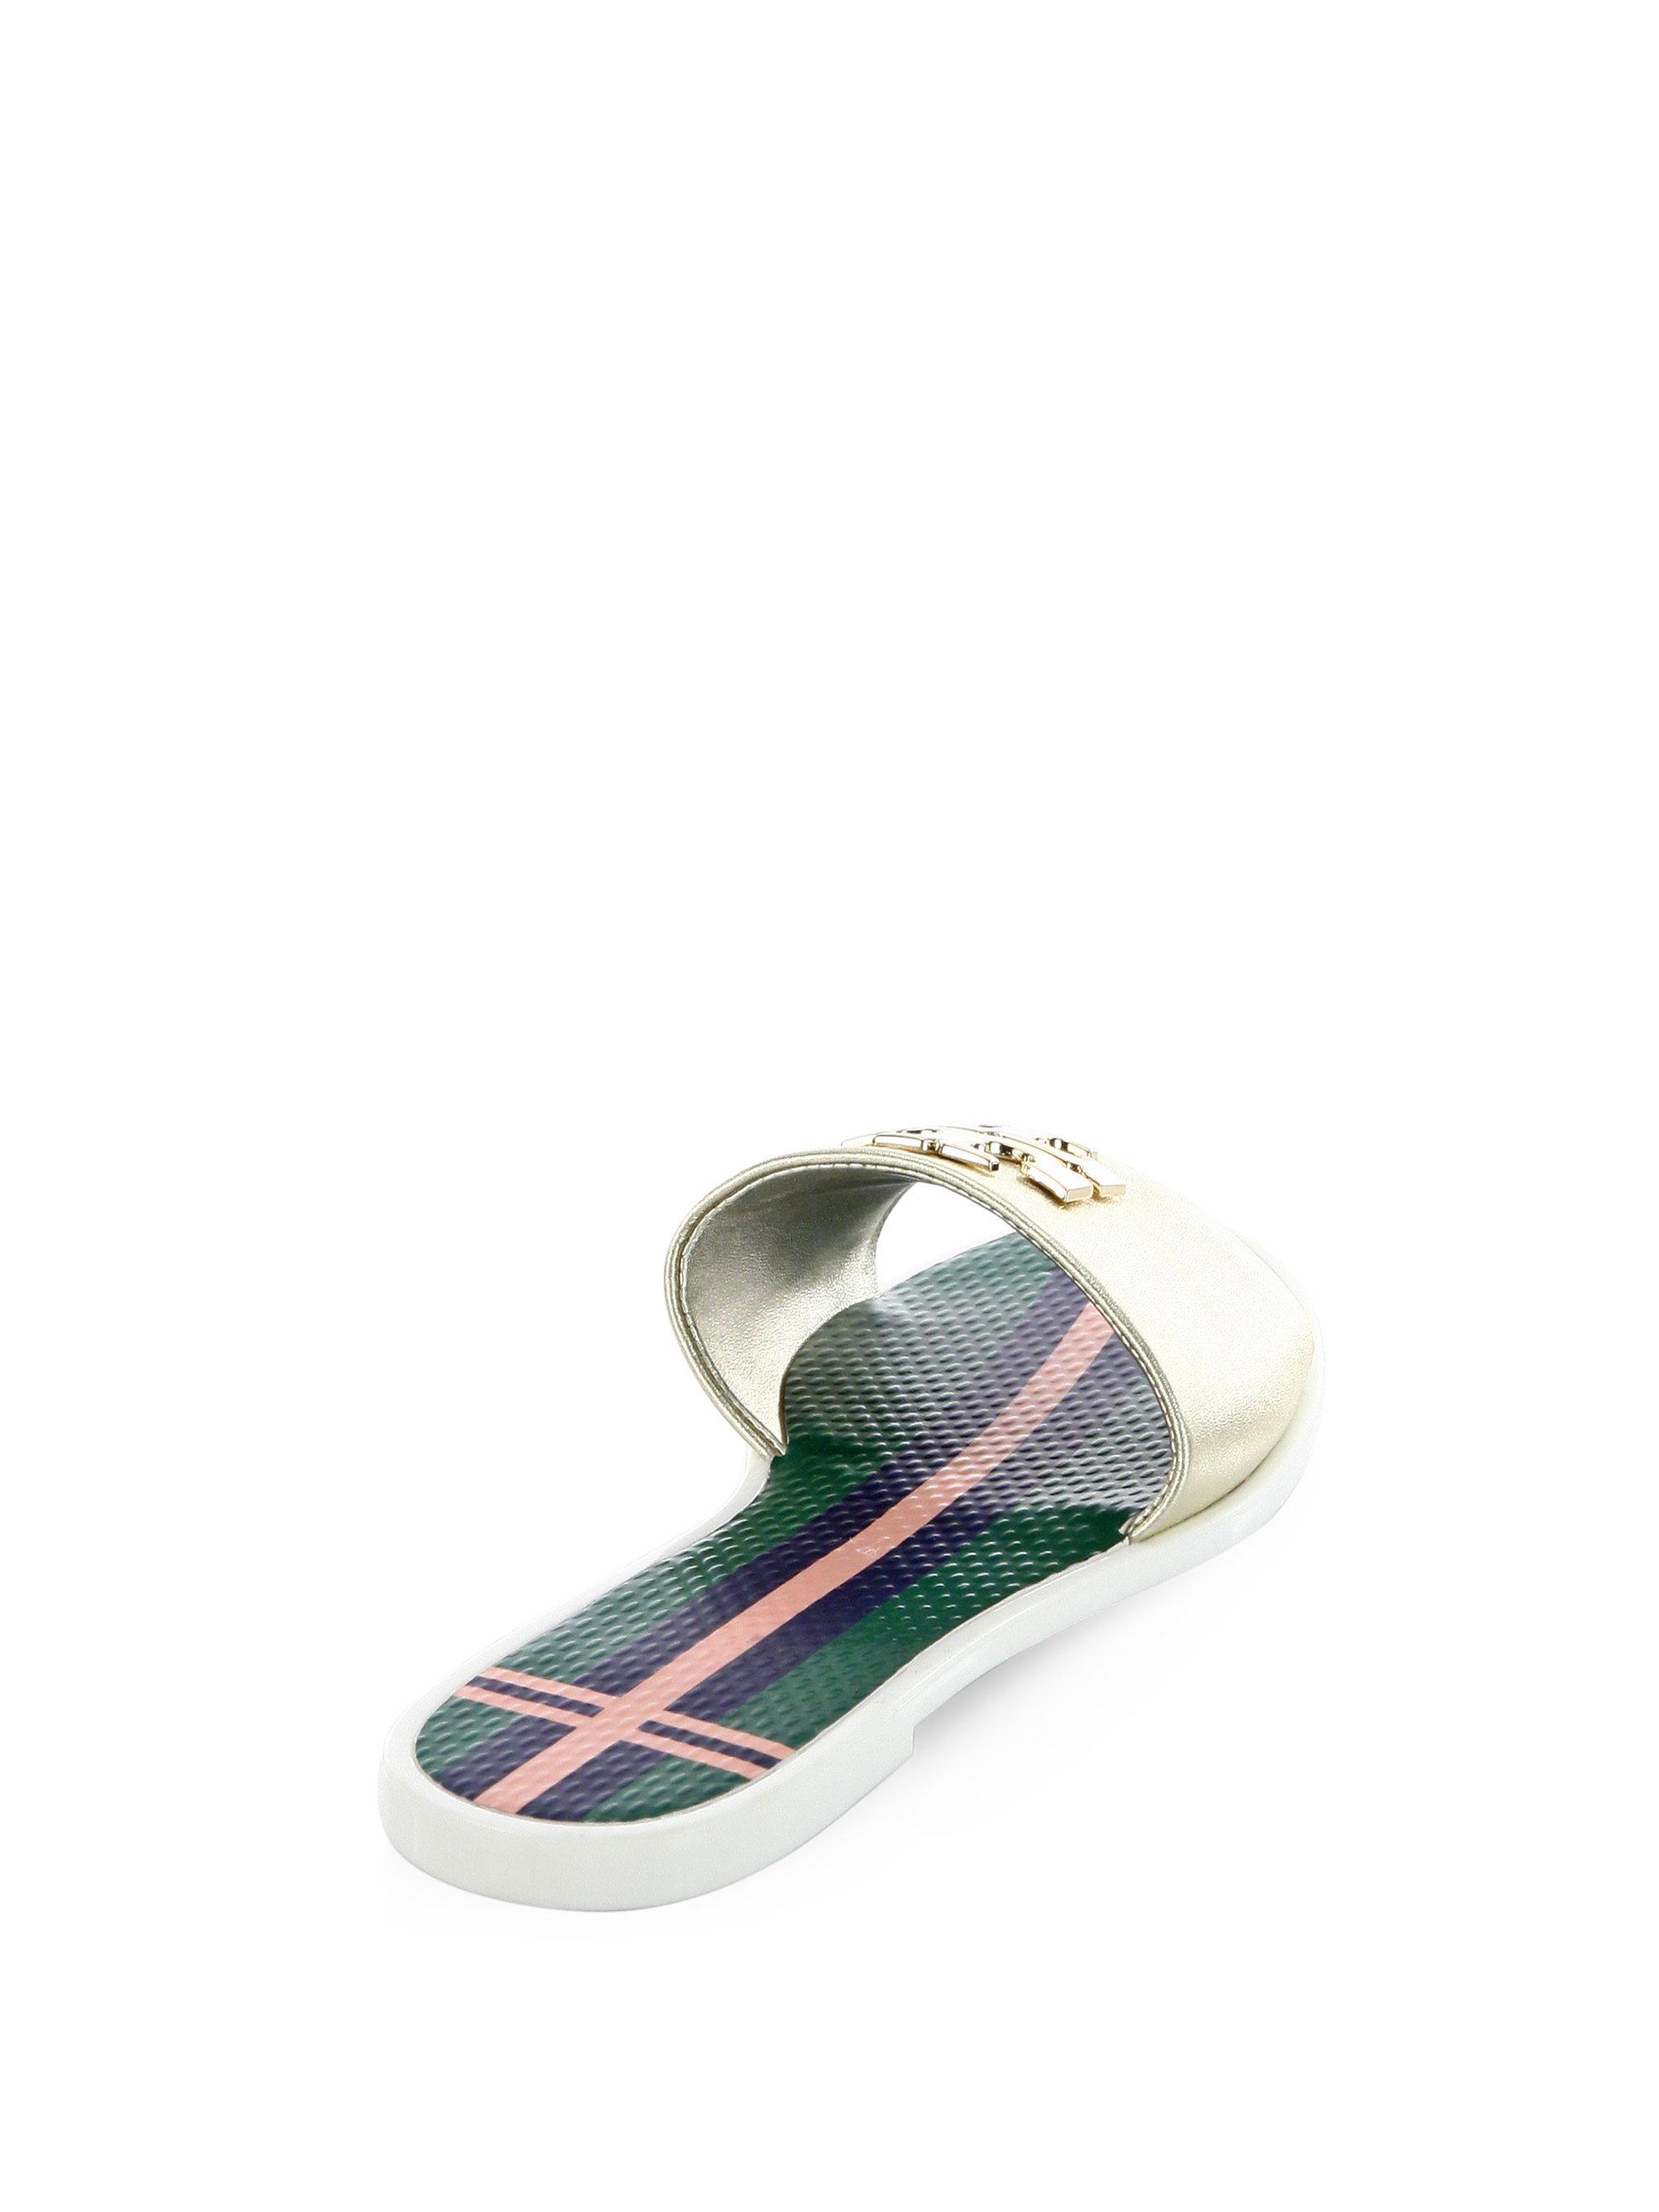 b73e0ce5c1f Lyst - Tory Burch Logo Leather Jelly Slide Sandal in Metallic